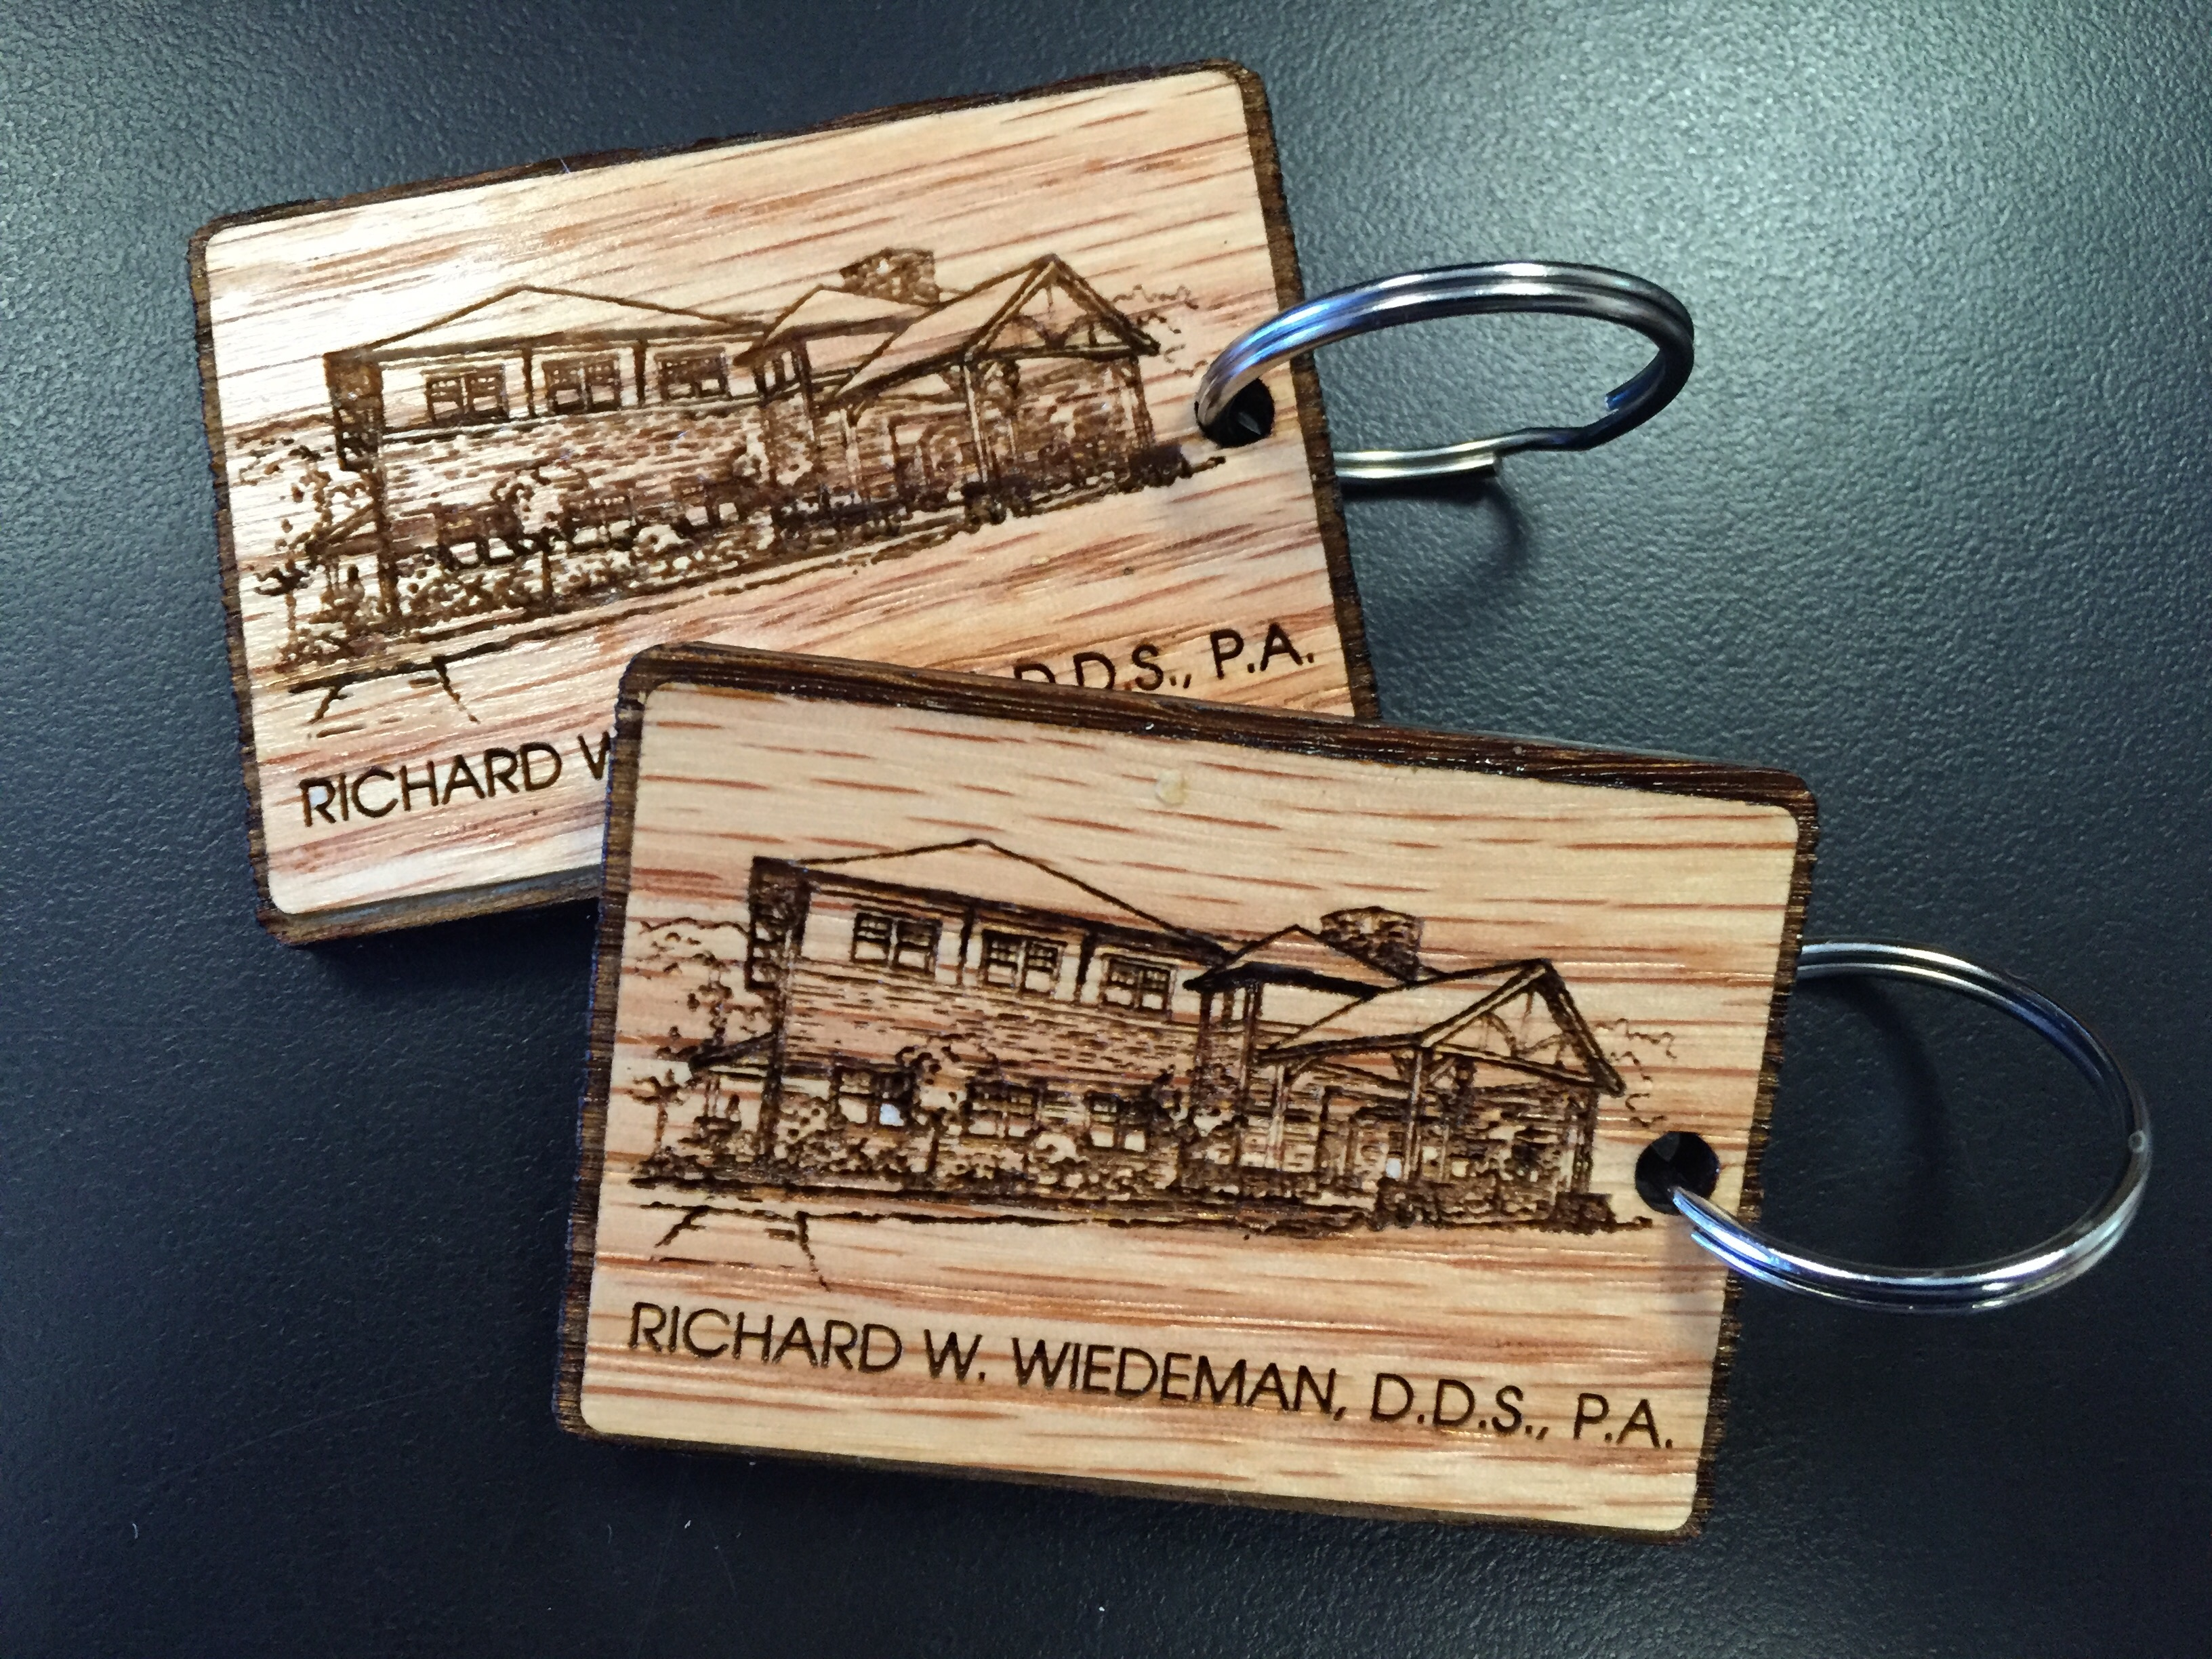 Laser Engraving - Richard W. Wiedman DDDS